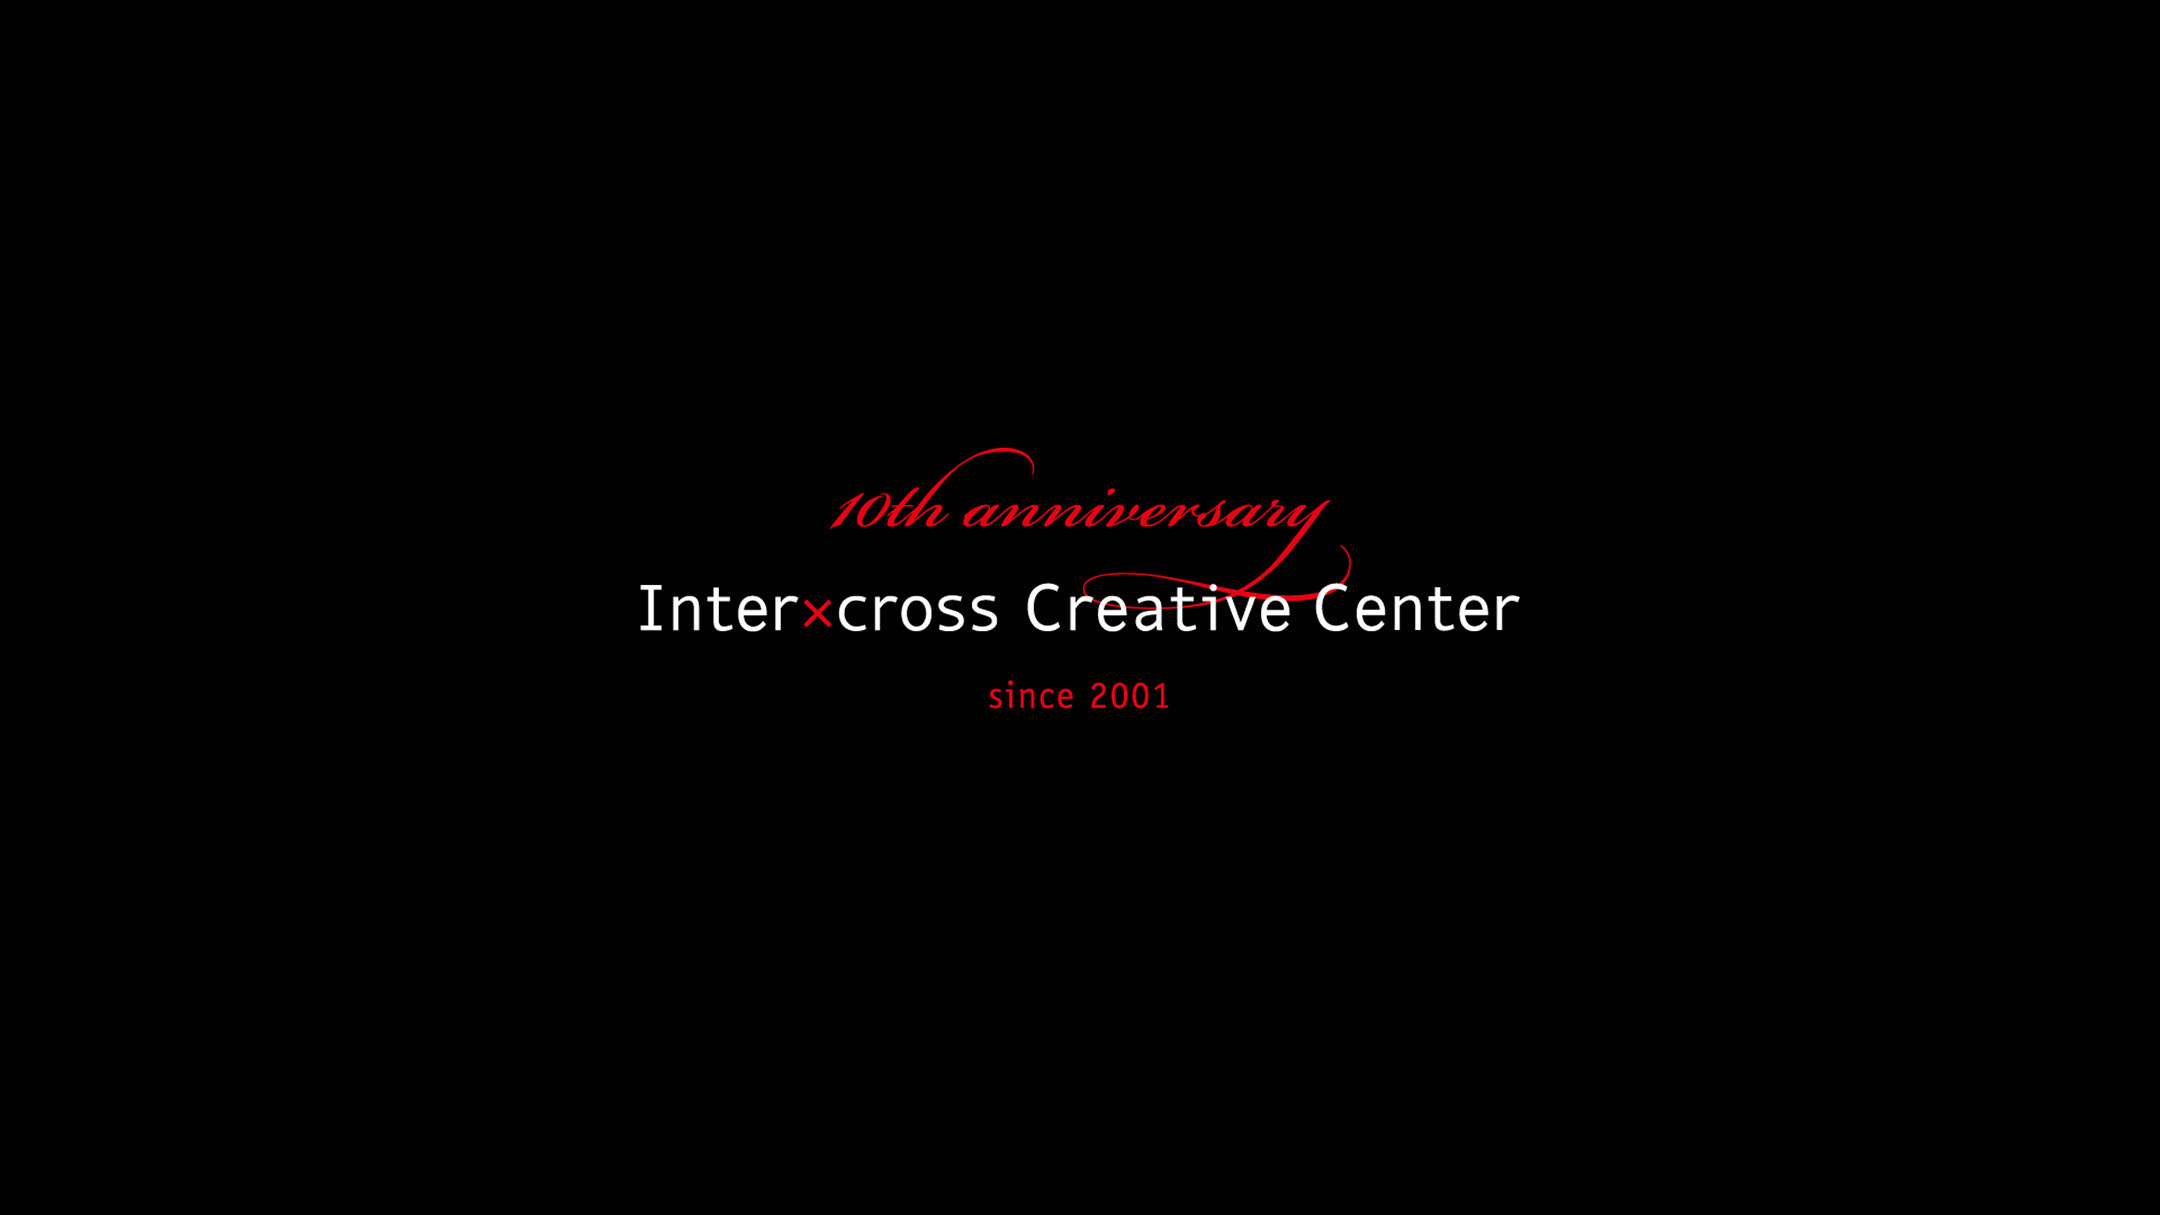 Inter-cross Creative Center